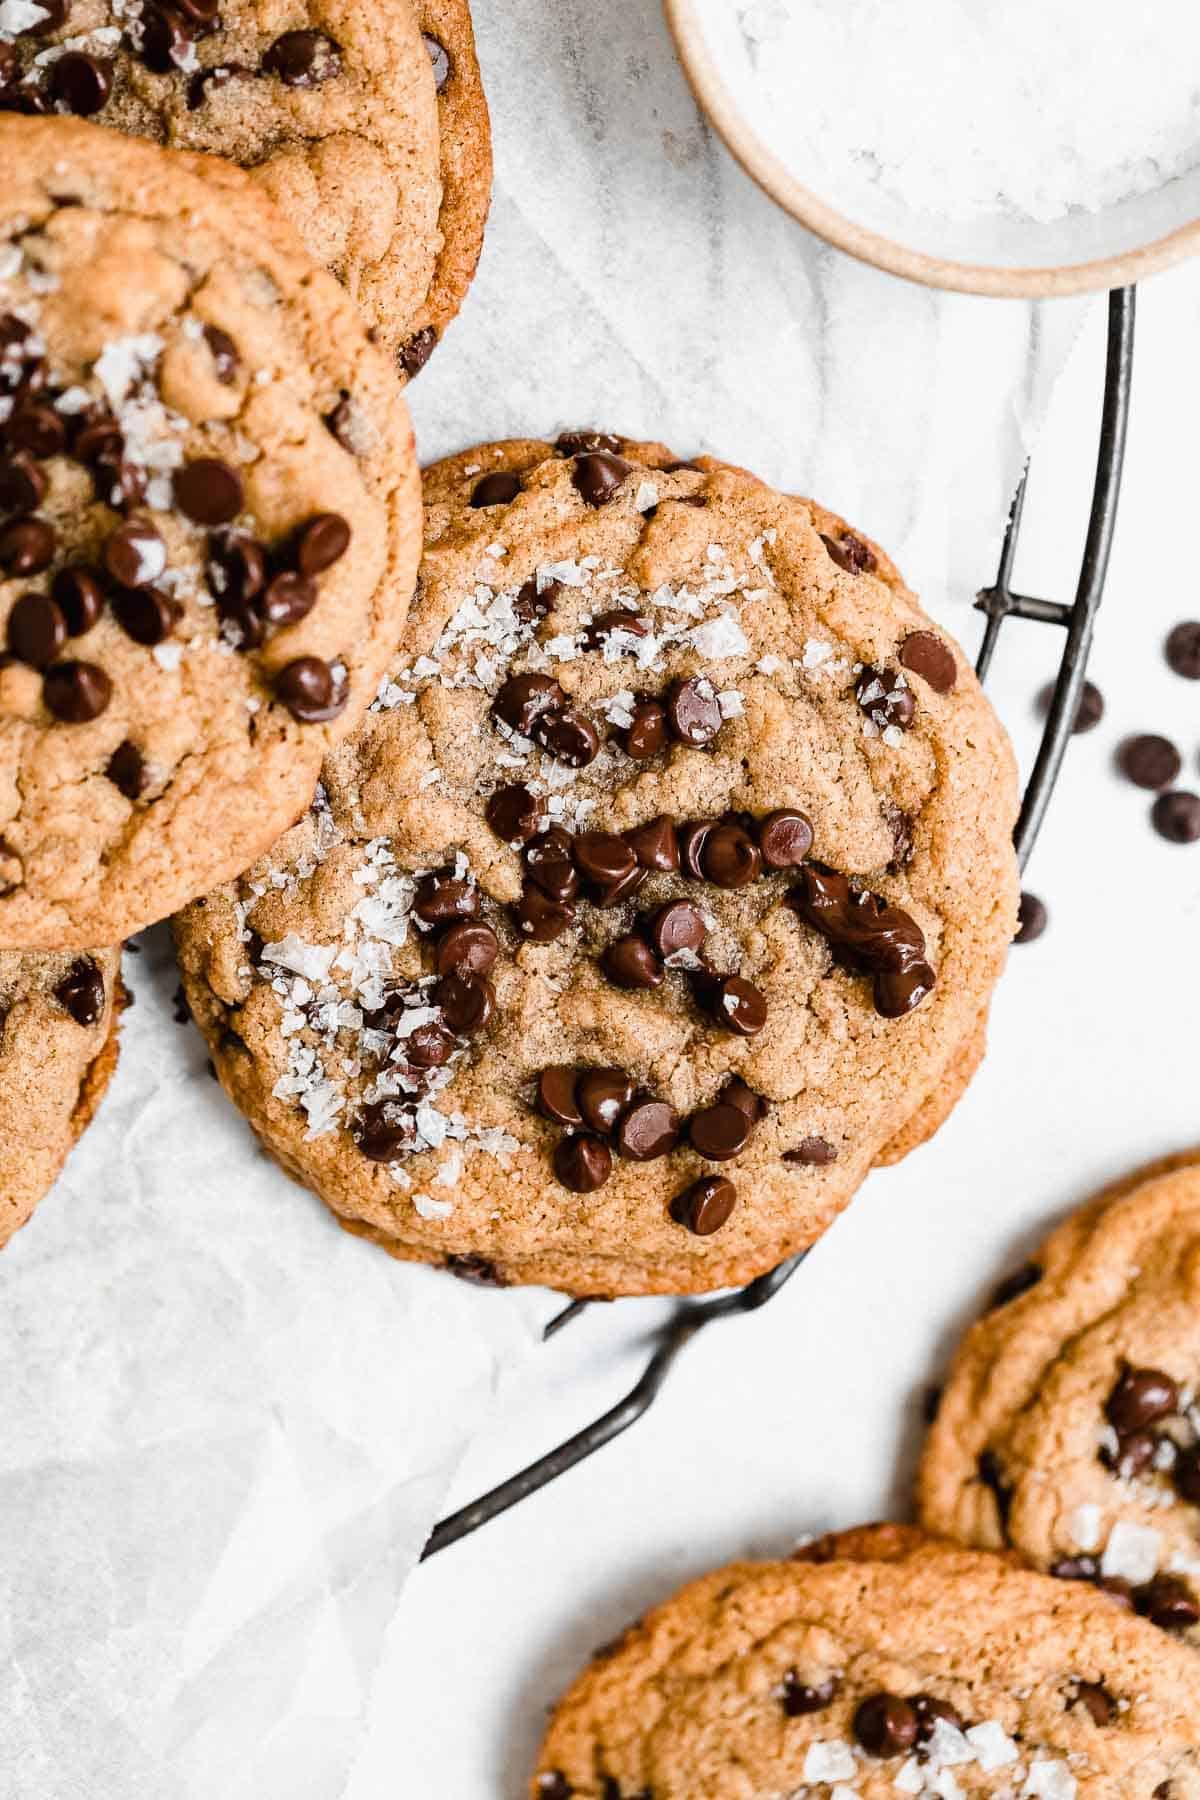 Overhead shot of peanut butter cookies with sea salt